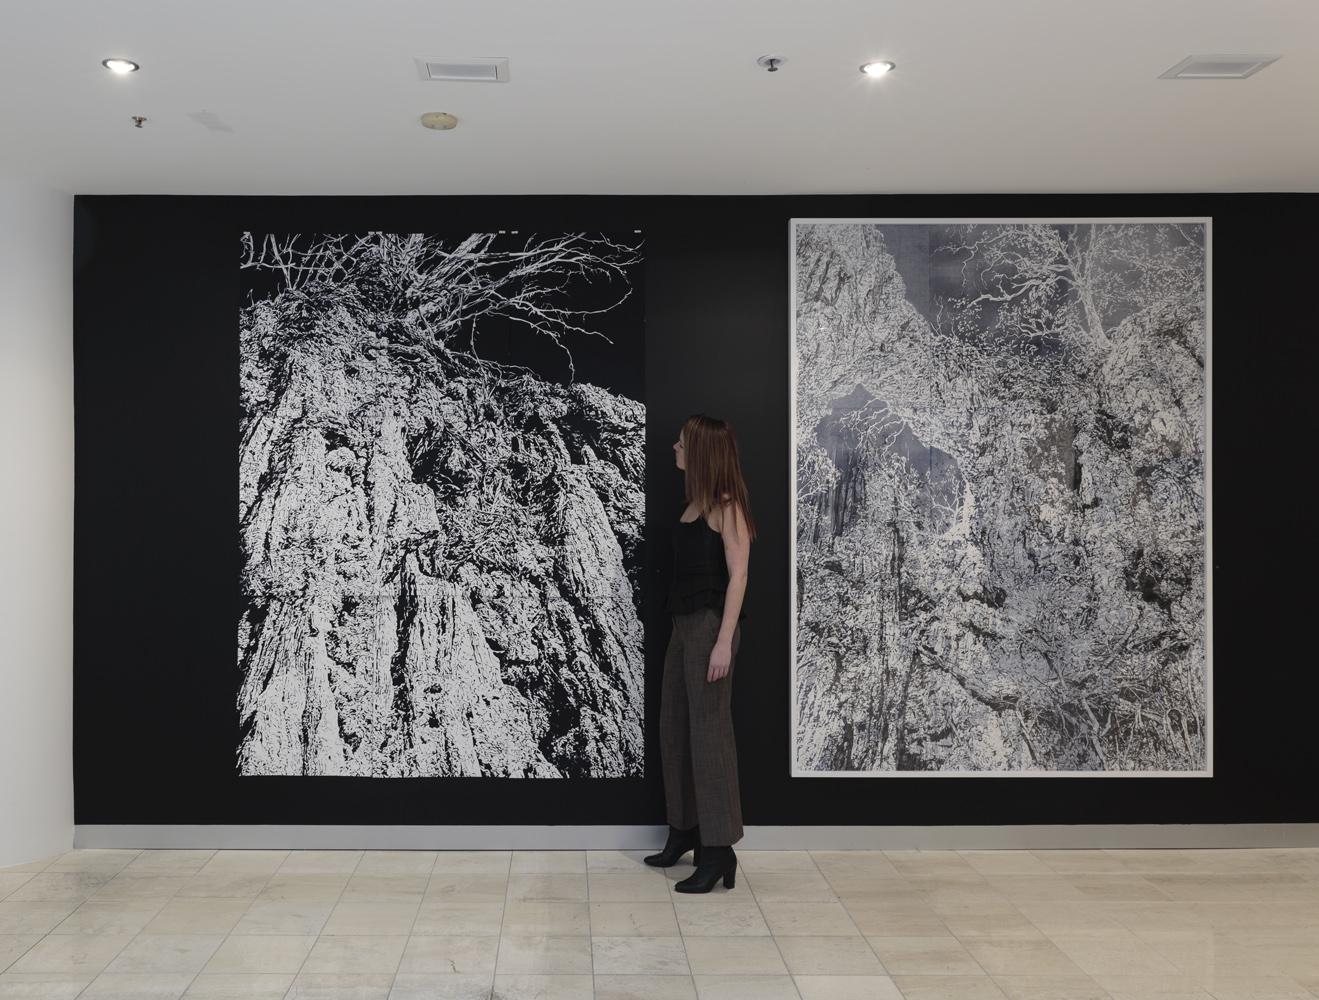 'Subterrain' install, 2018, Collins Place Gallery, photo by Tim Gresham